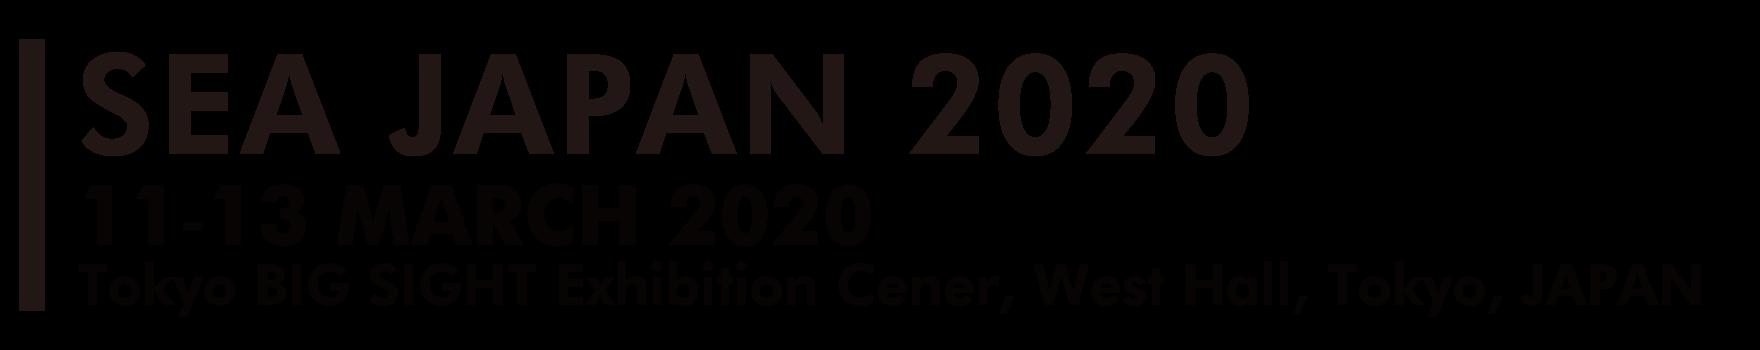 Sea Japan 2020 11-13 May 2020 Tokyo Big Sight Exhibition Center, West Hall, Tokyo, Japan